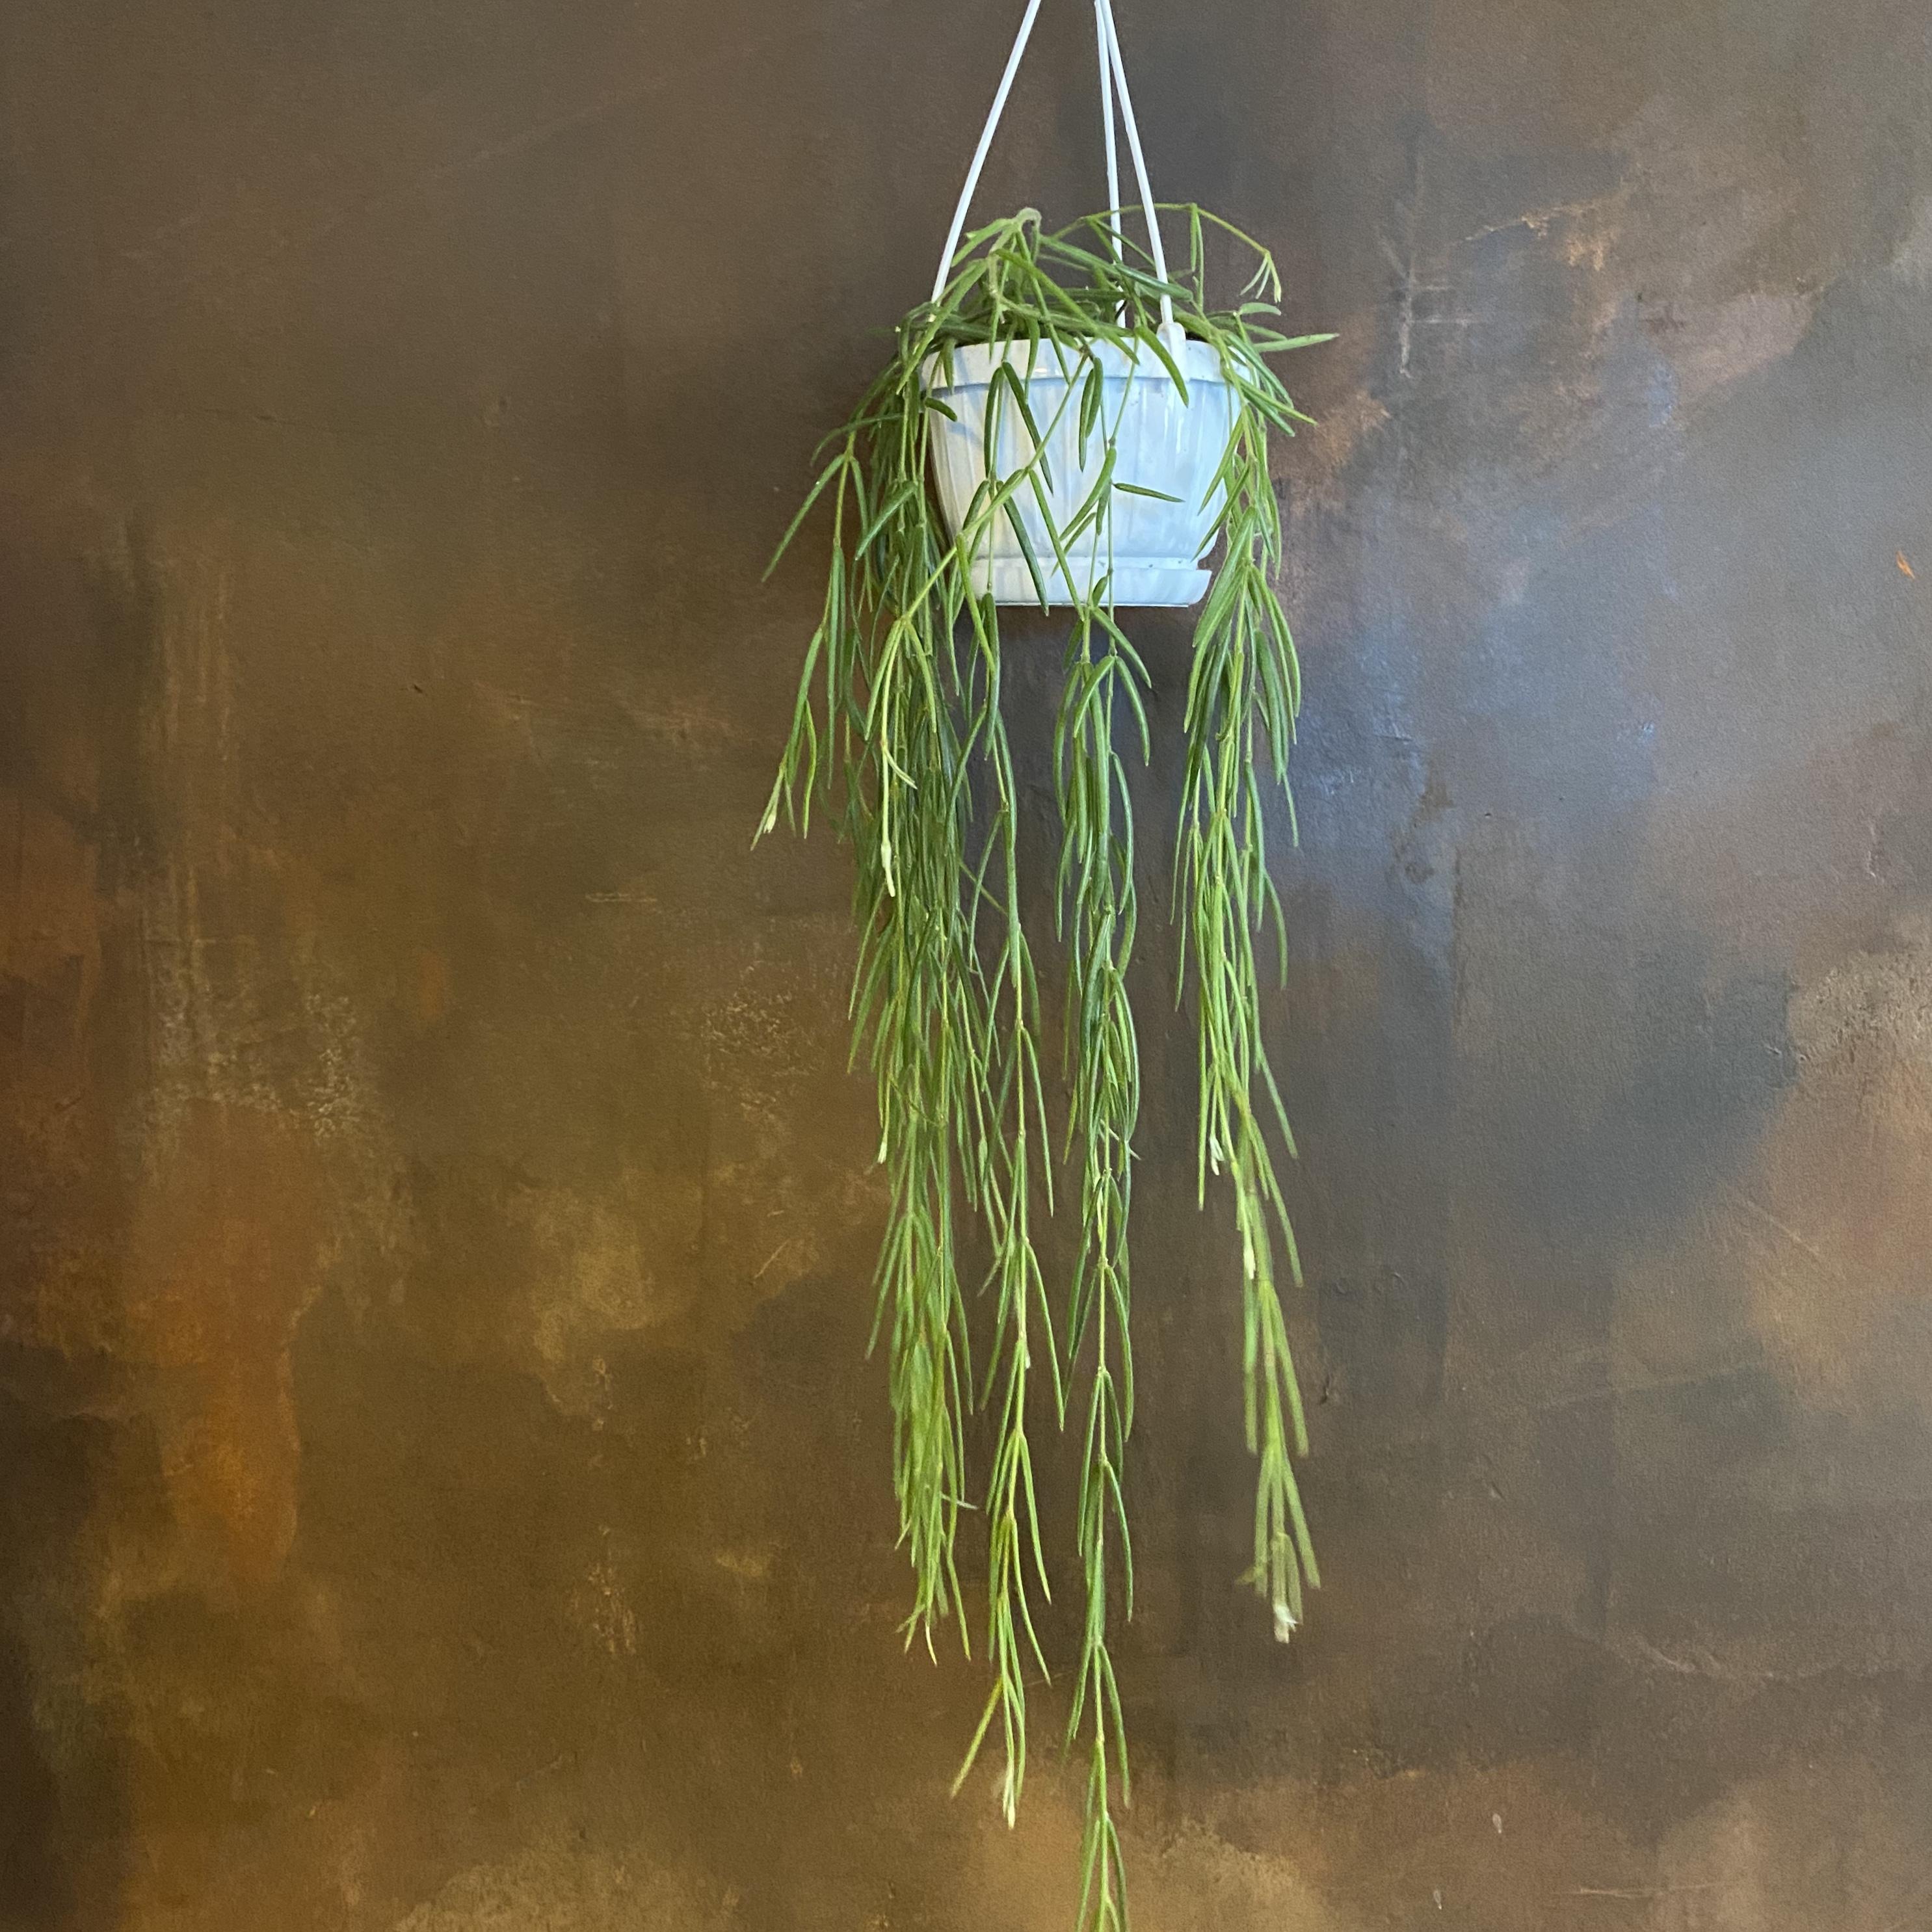 Hoya linearis (12cm hangpot)